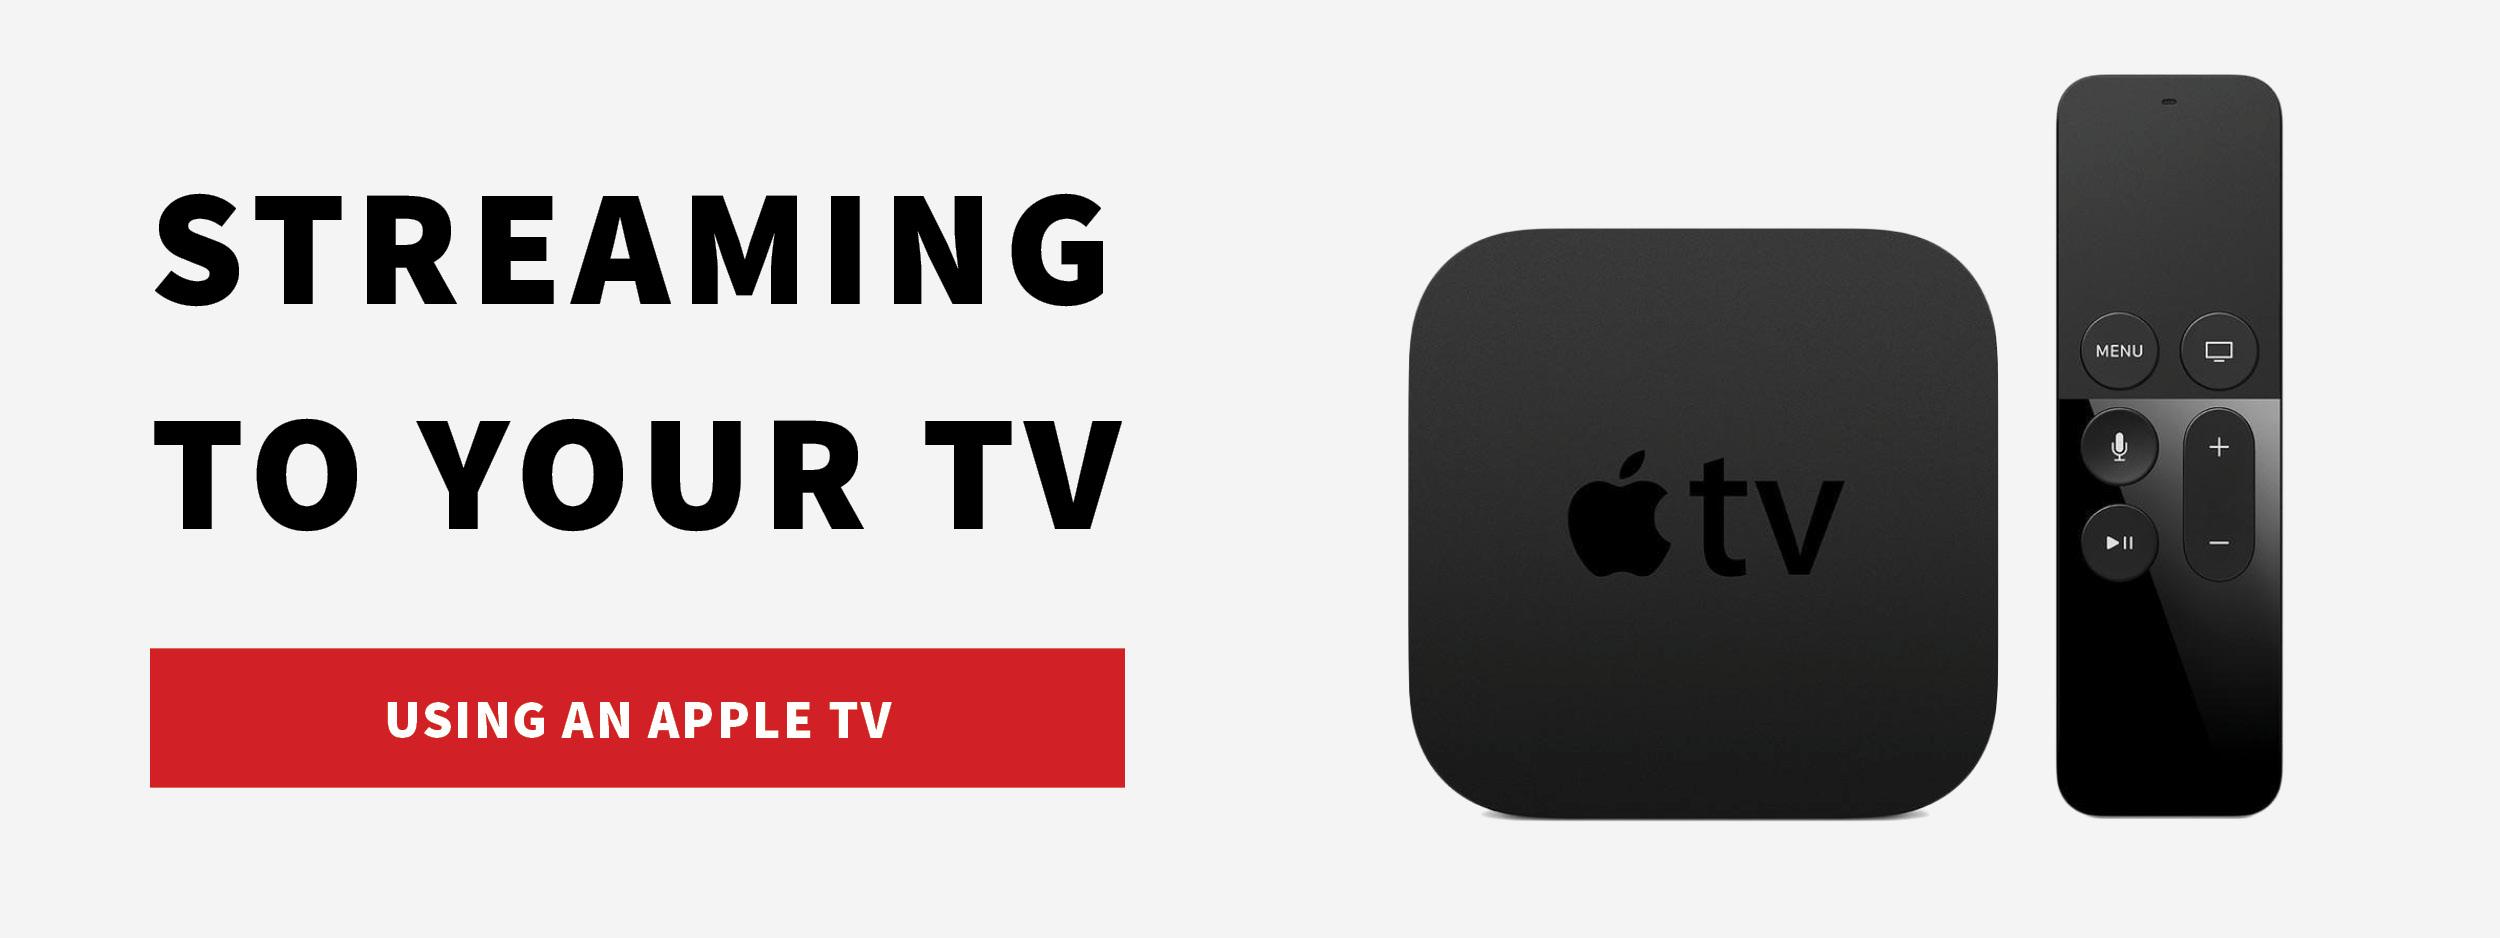 Stream using an Apple TV